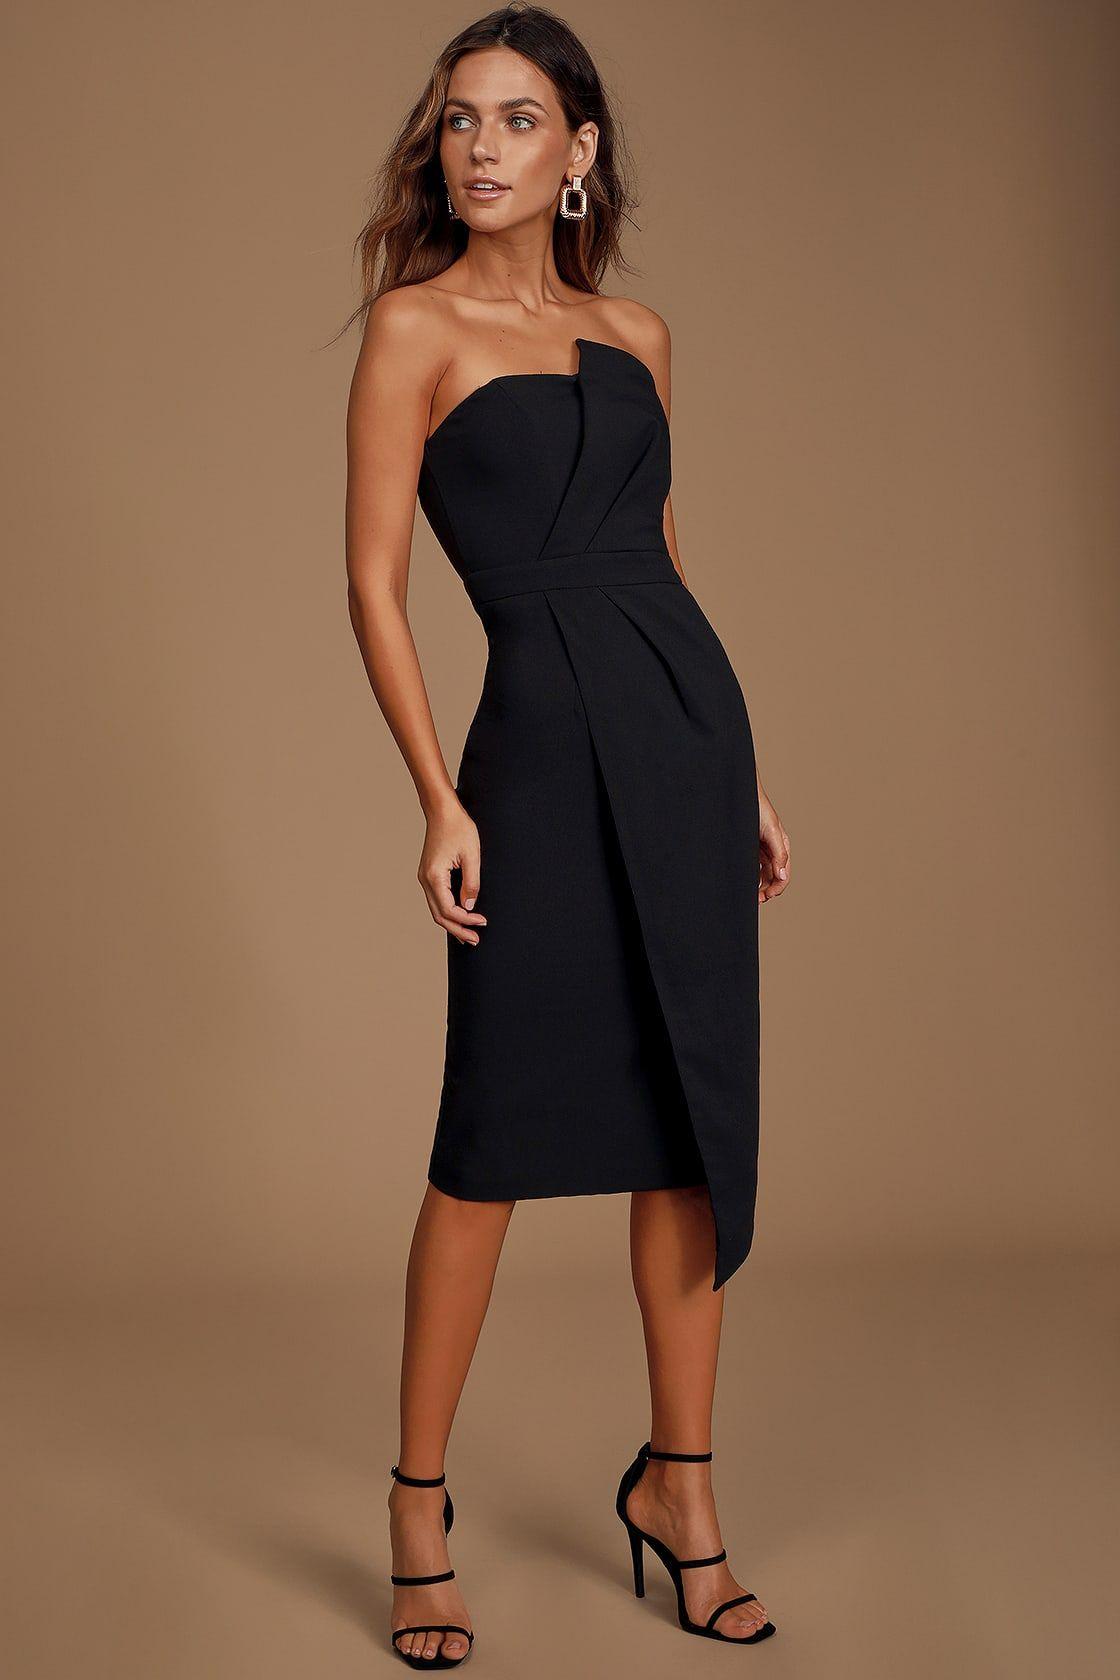 Never Been Better Black Strapless Midi Dress Strapless Midi Dress Lace Midi Dress Black Strapless Midi Dress [ 1680 x 1120 Pixel ]